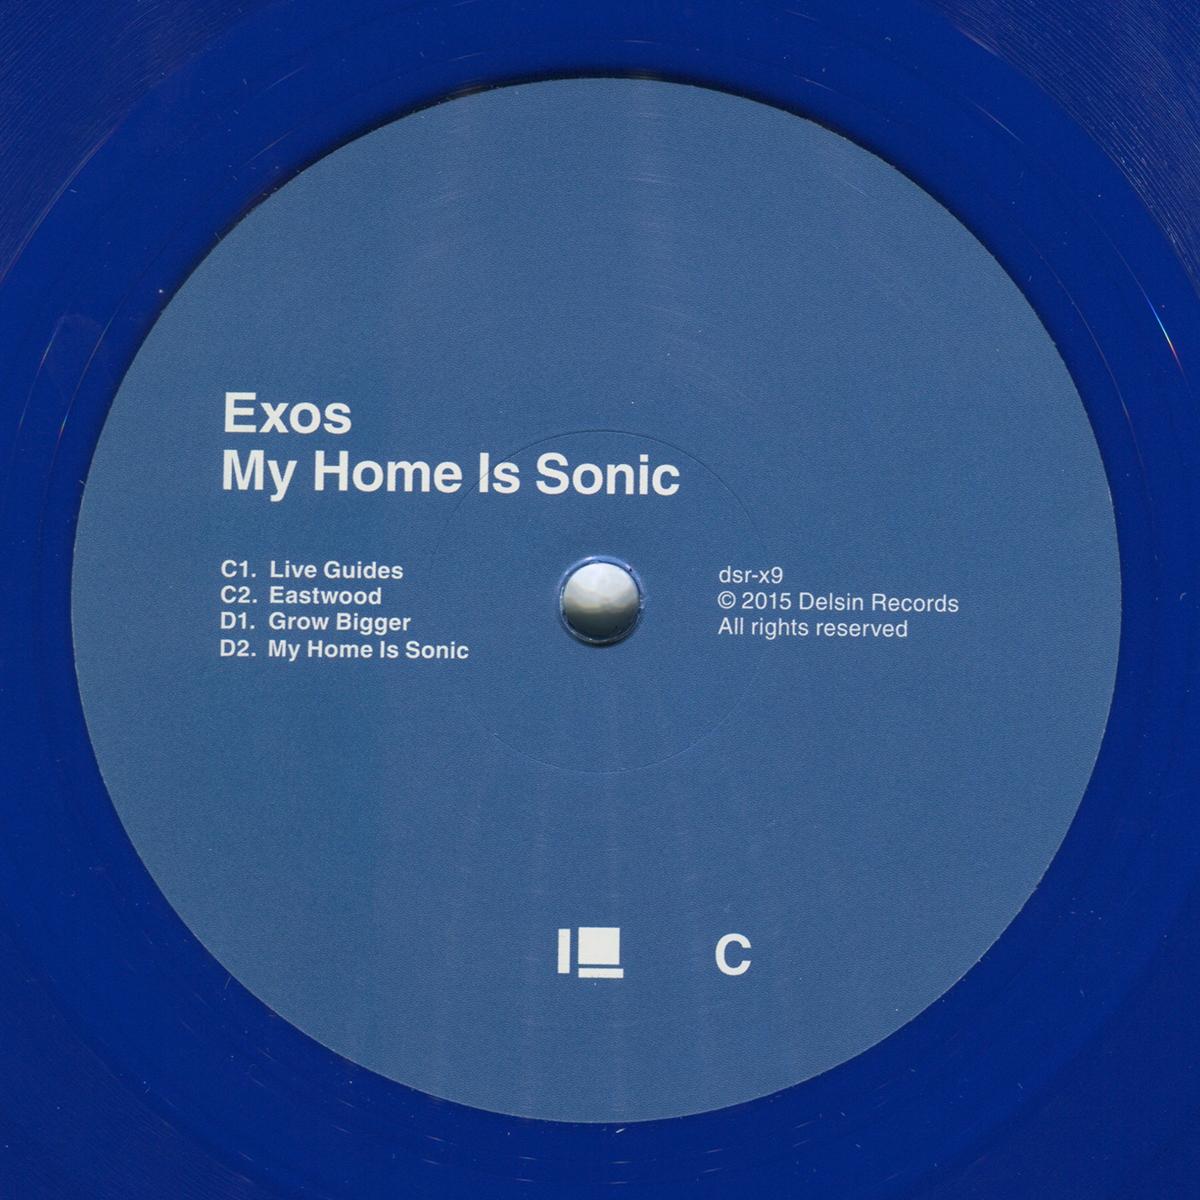 Delsin Records   Exos   My Home Is Sonic   Delsin Records